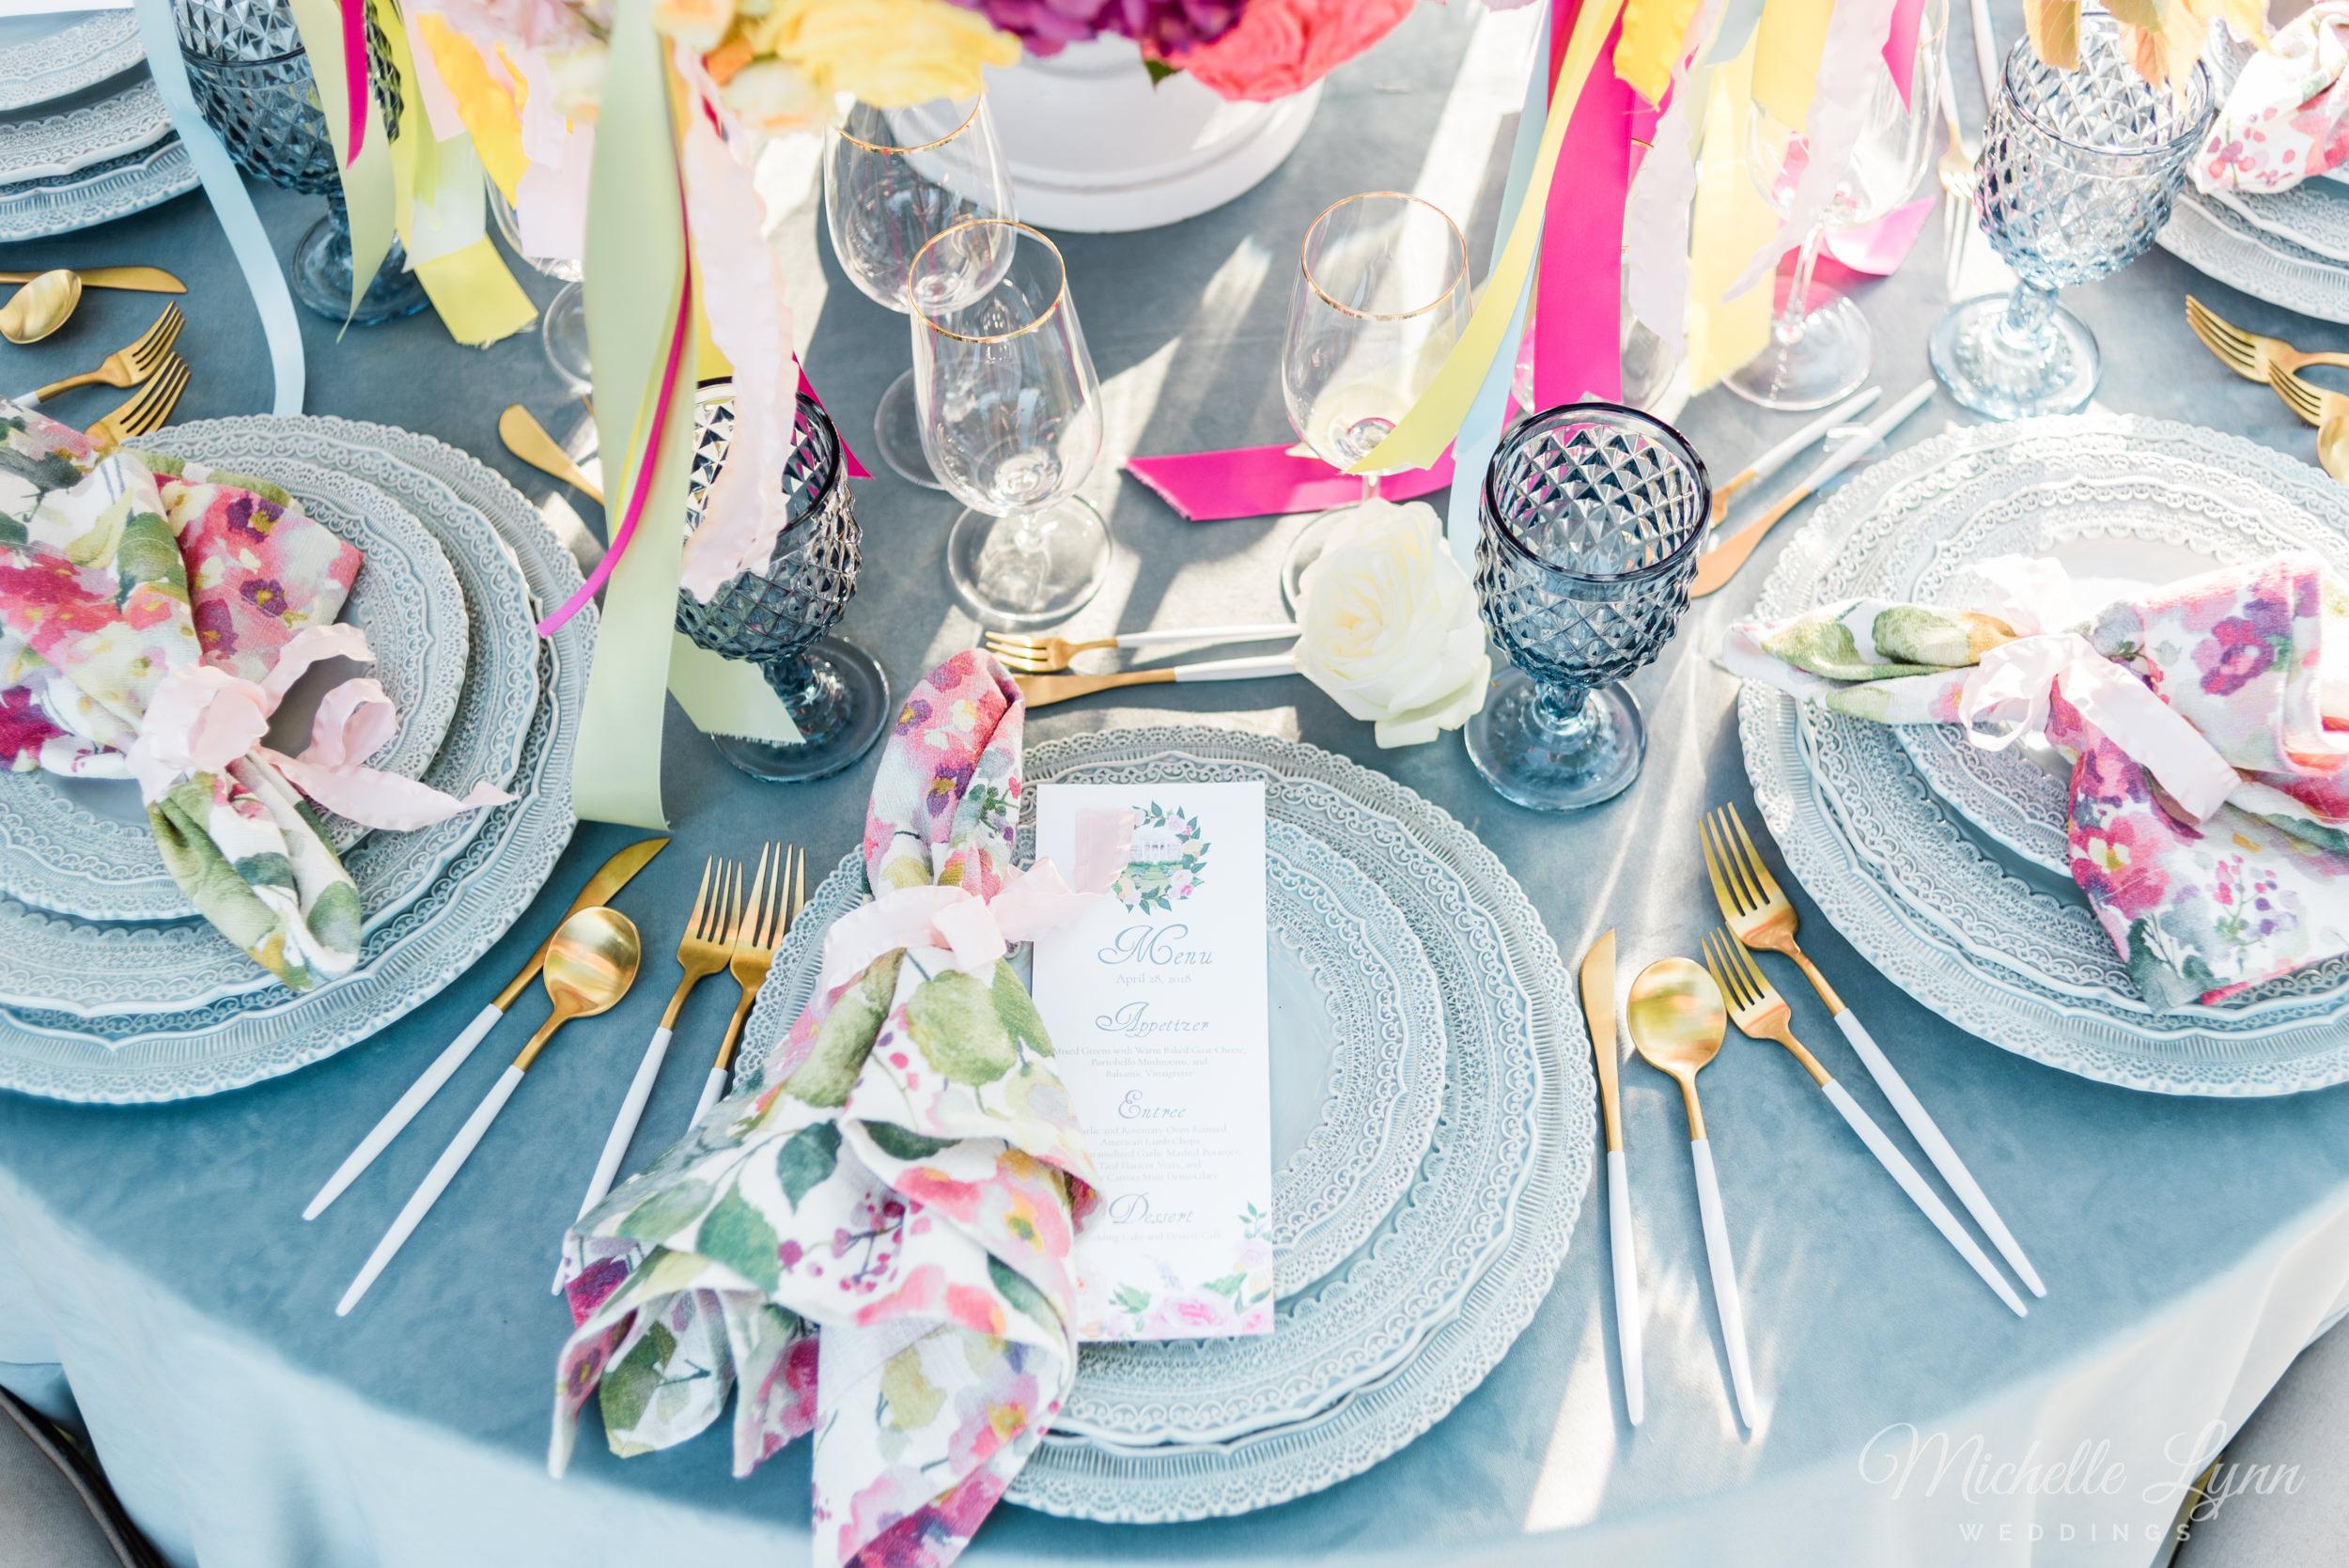 mlw-whitehall-annapolis-maryland-wedding-19.jpg